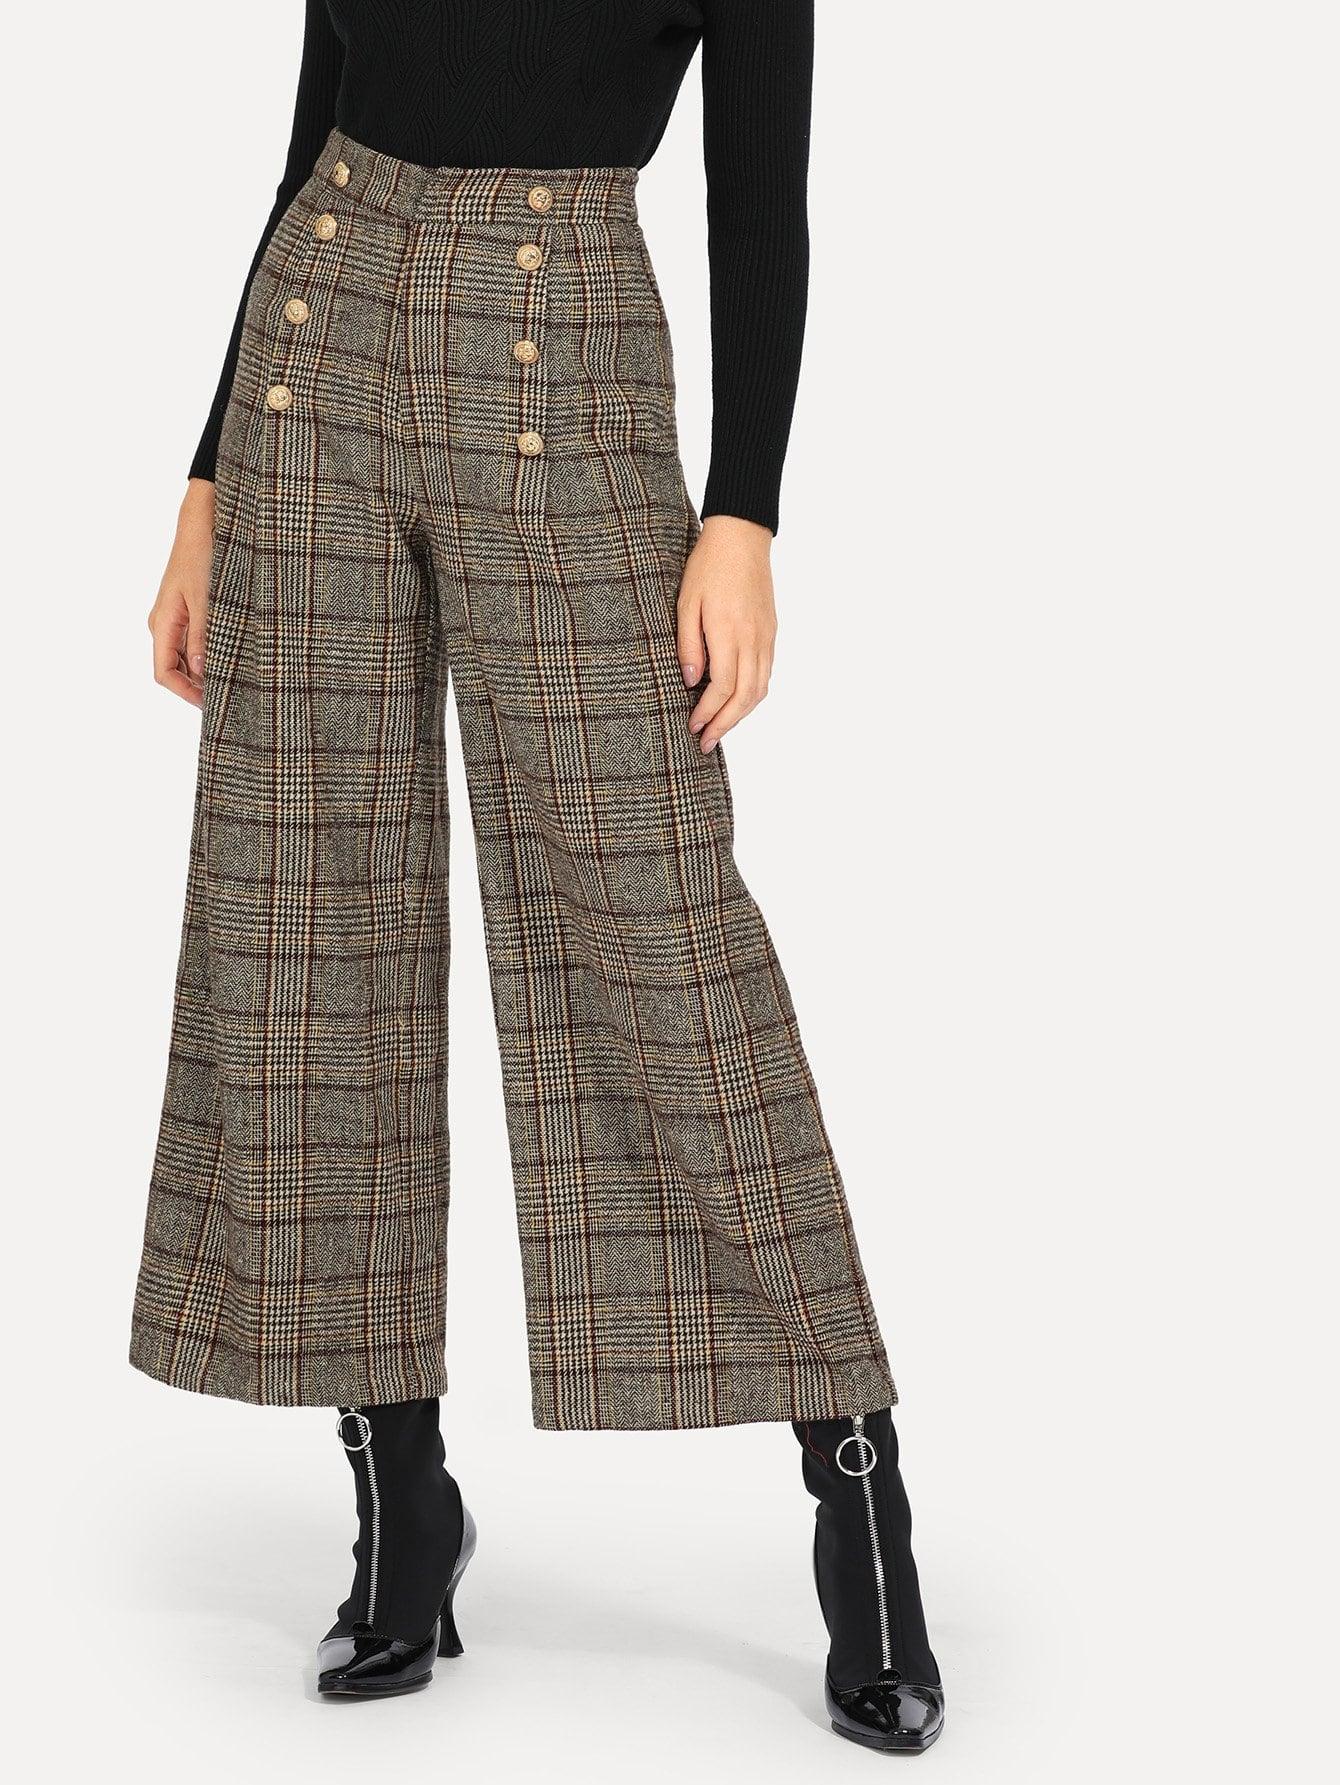 Купить Двубортные Палаццо брюки, Nathane, SheIn